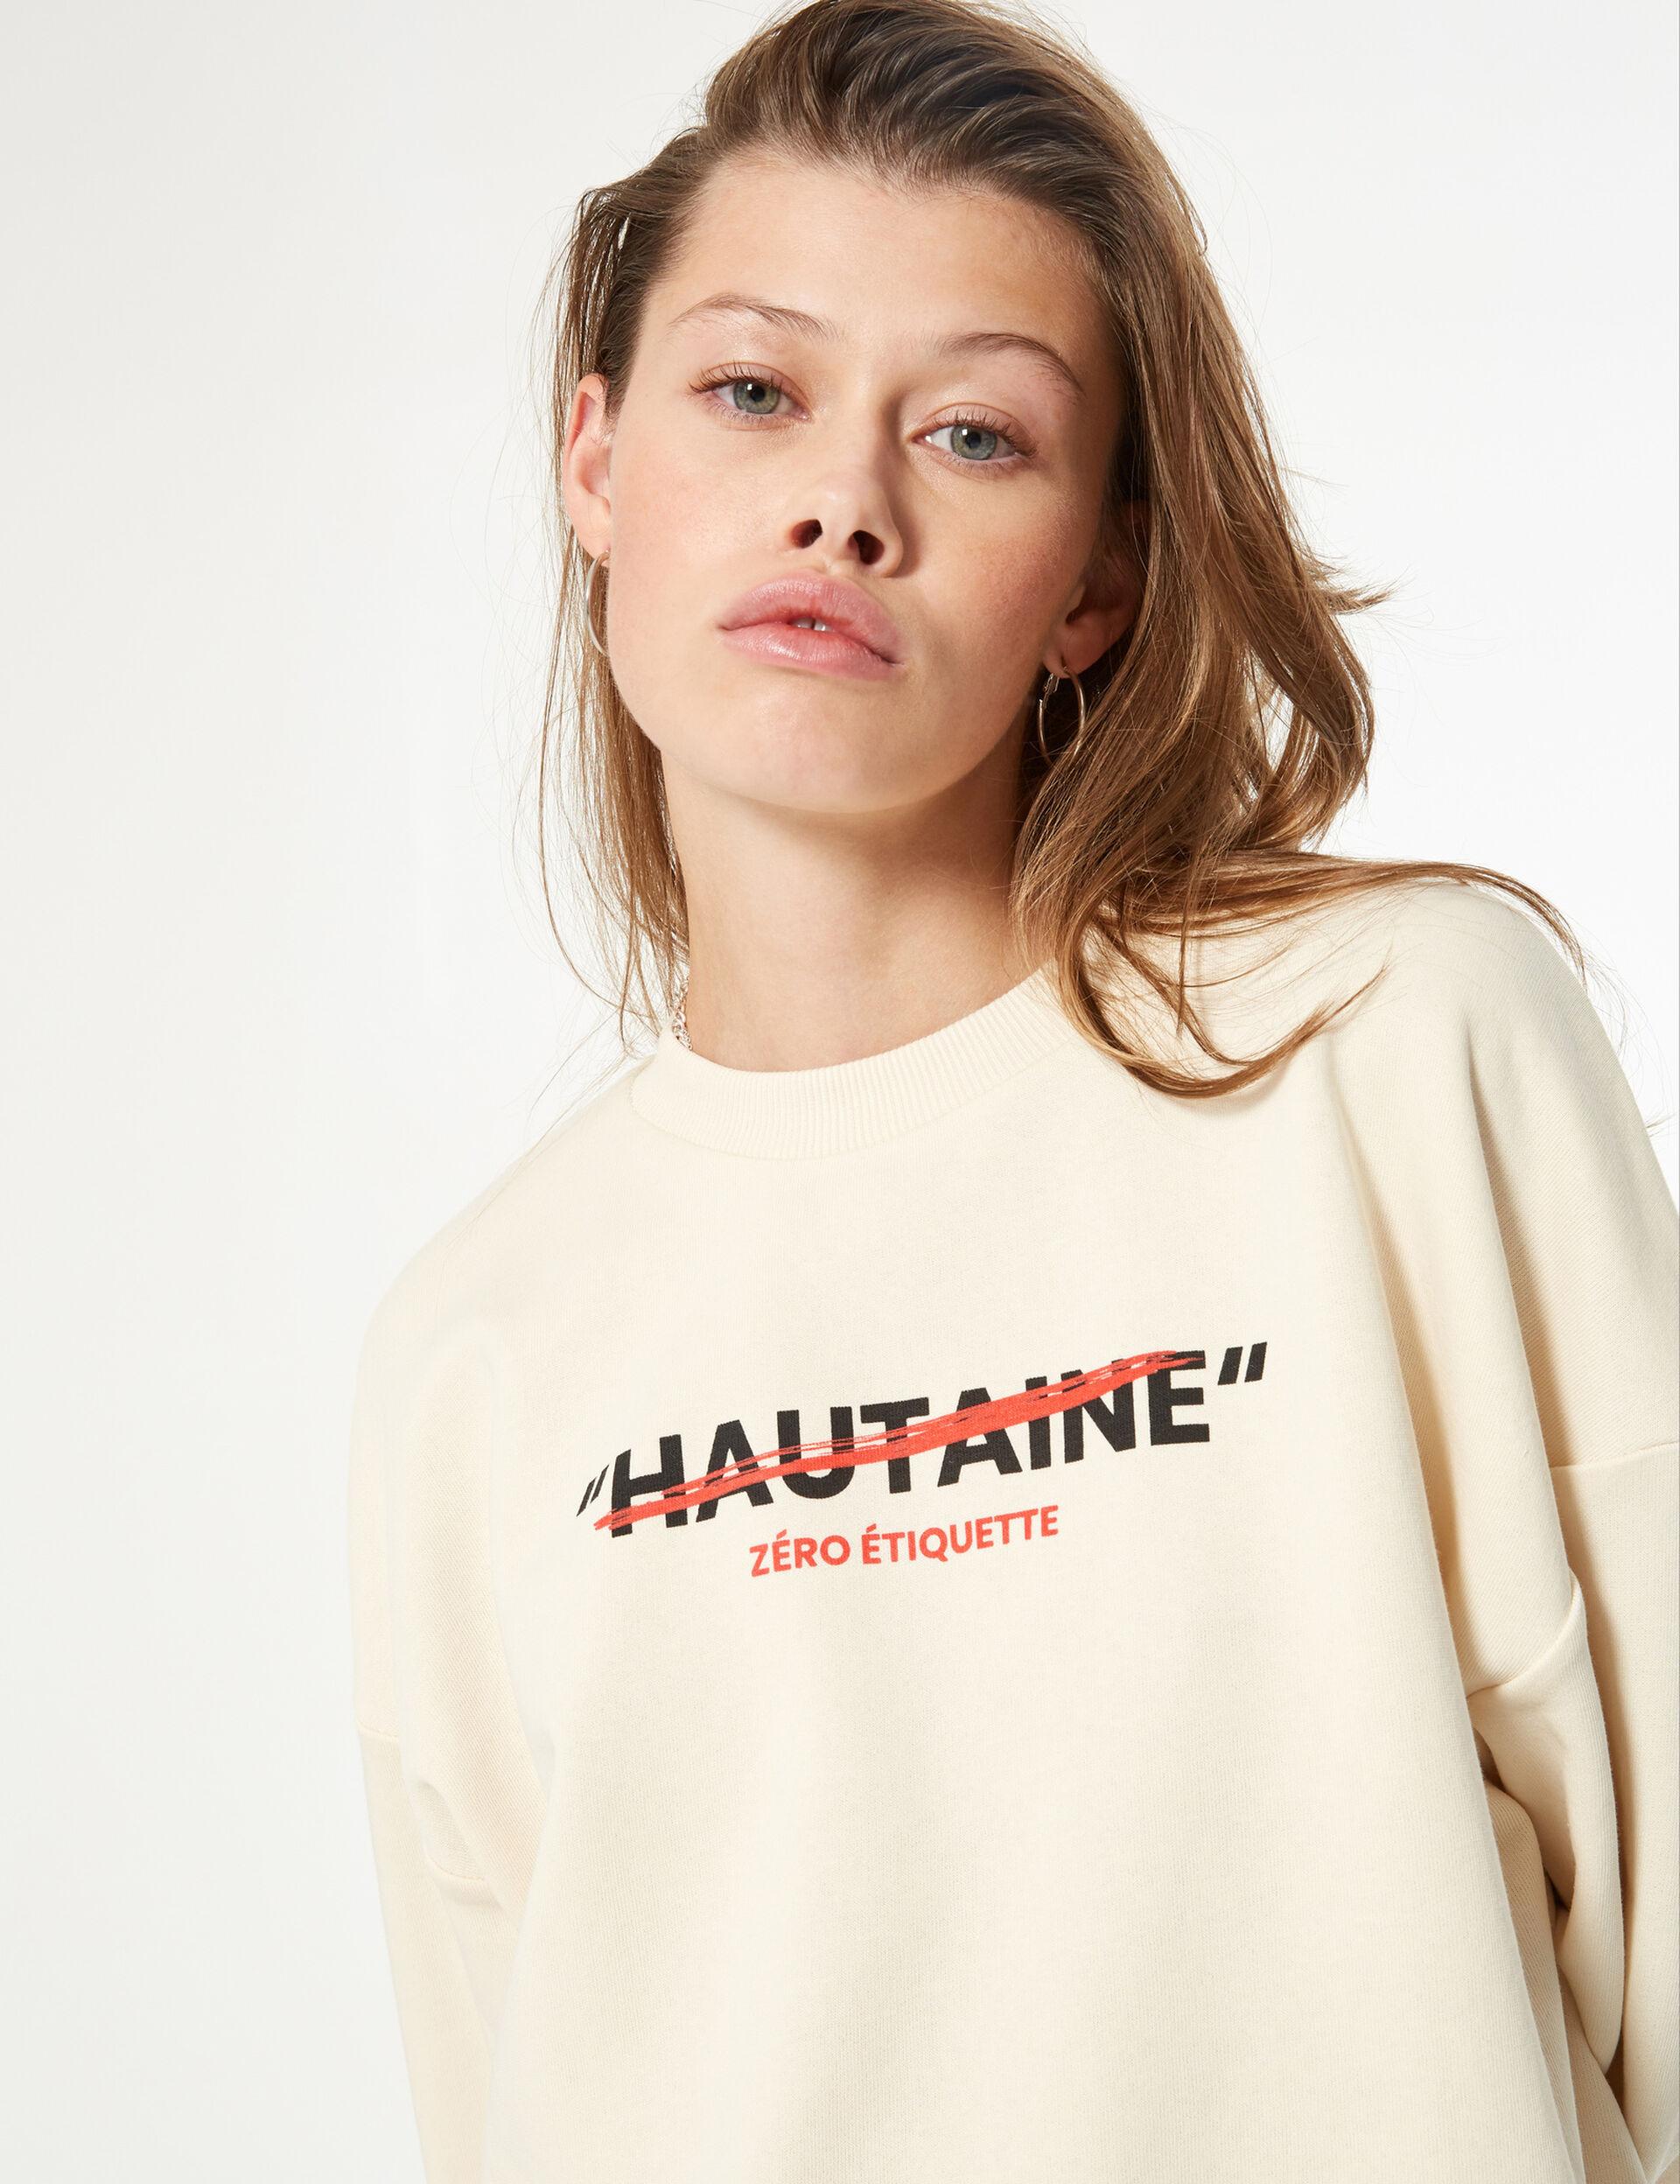 Don't call me sweatshirt